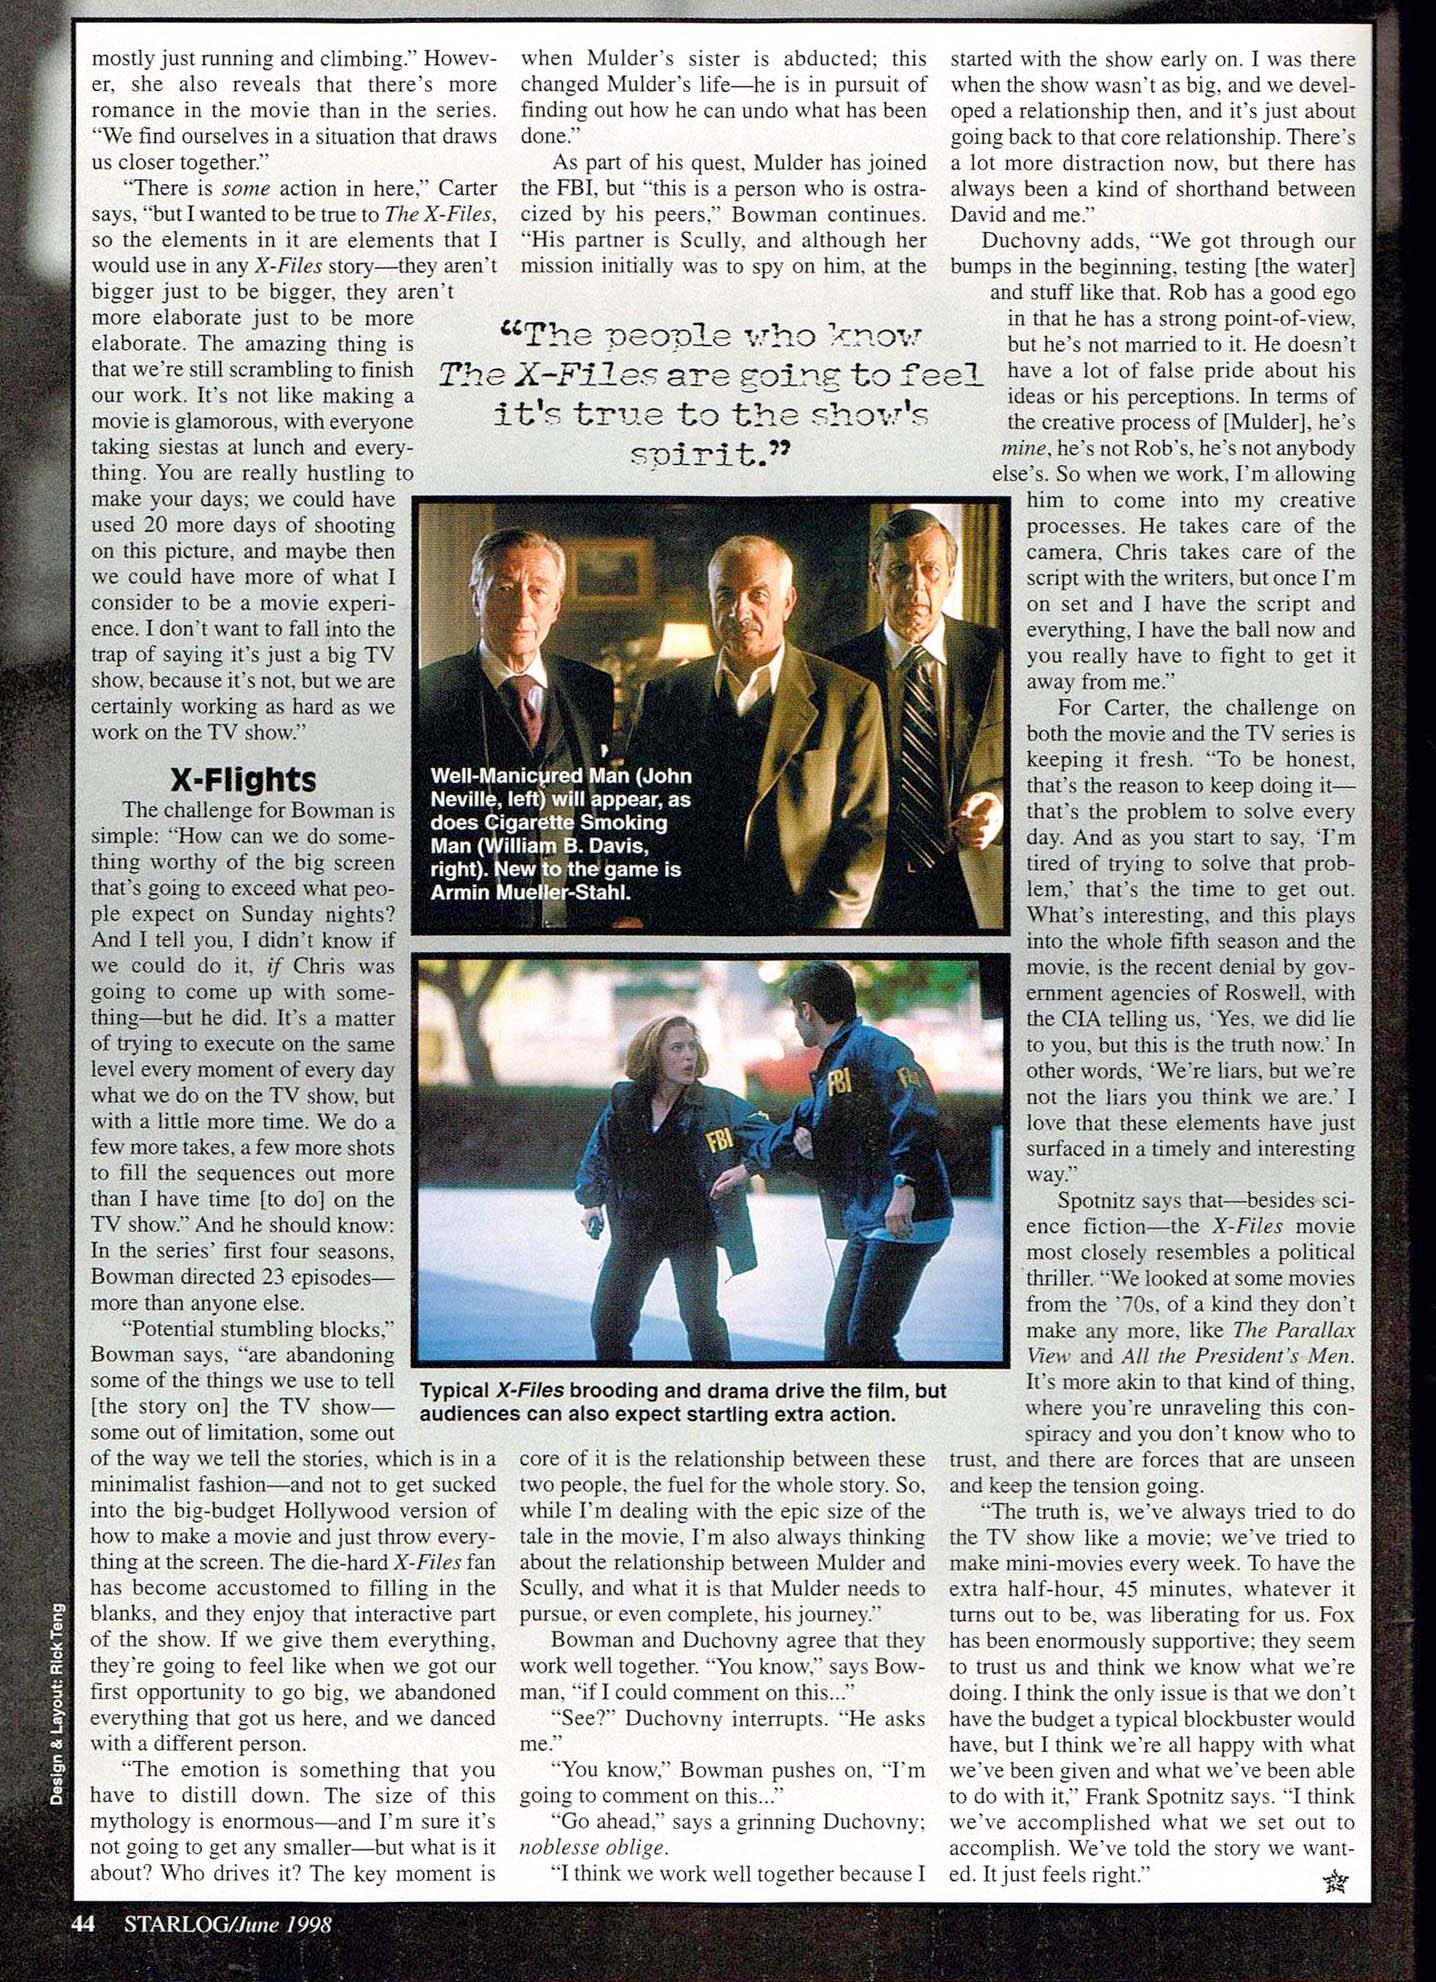 Starlog 251 1998 06 X-Files-6.jpg